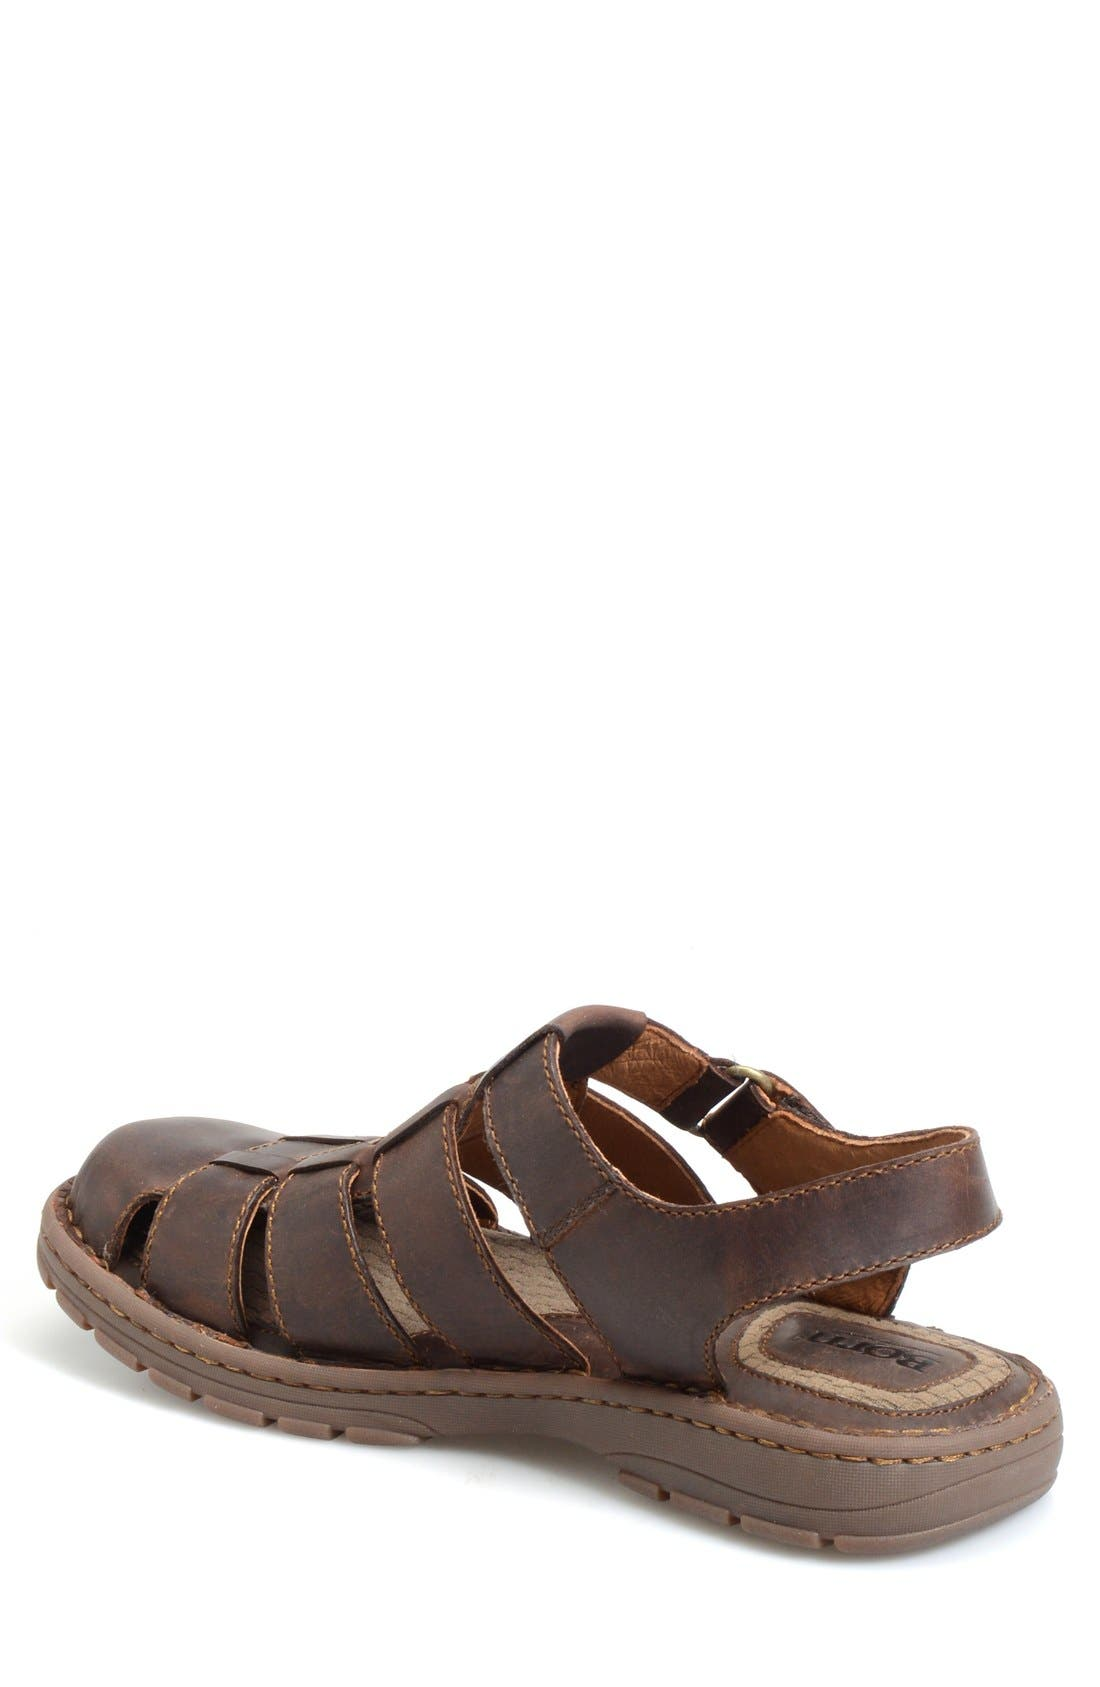 Alternate Image 2  - Børn 'Osmond' Leather Sandal (Men)